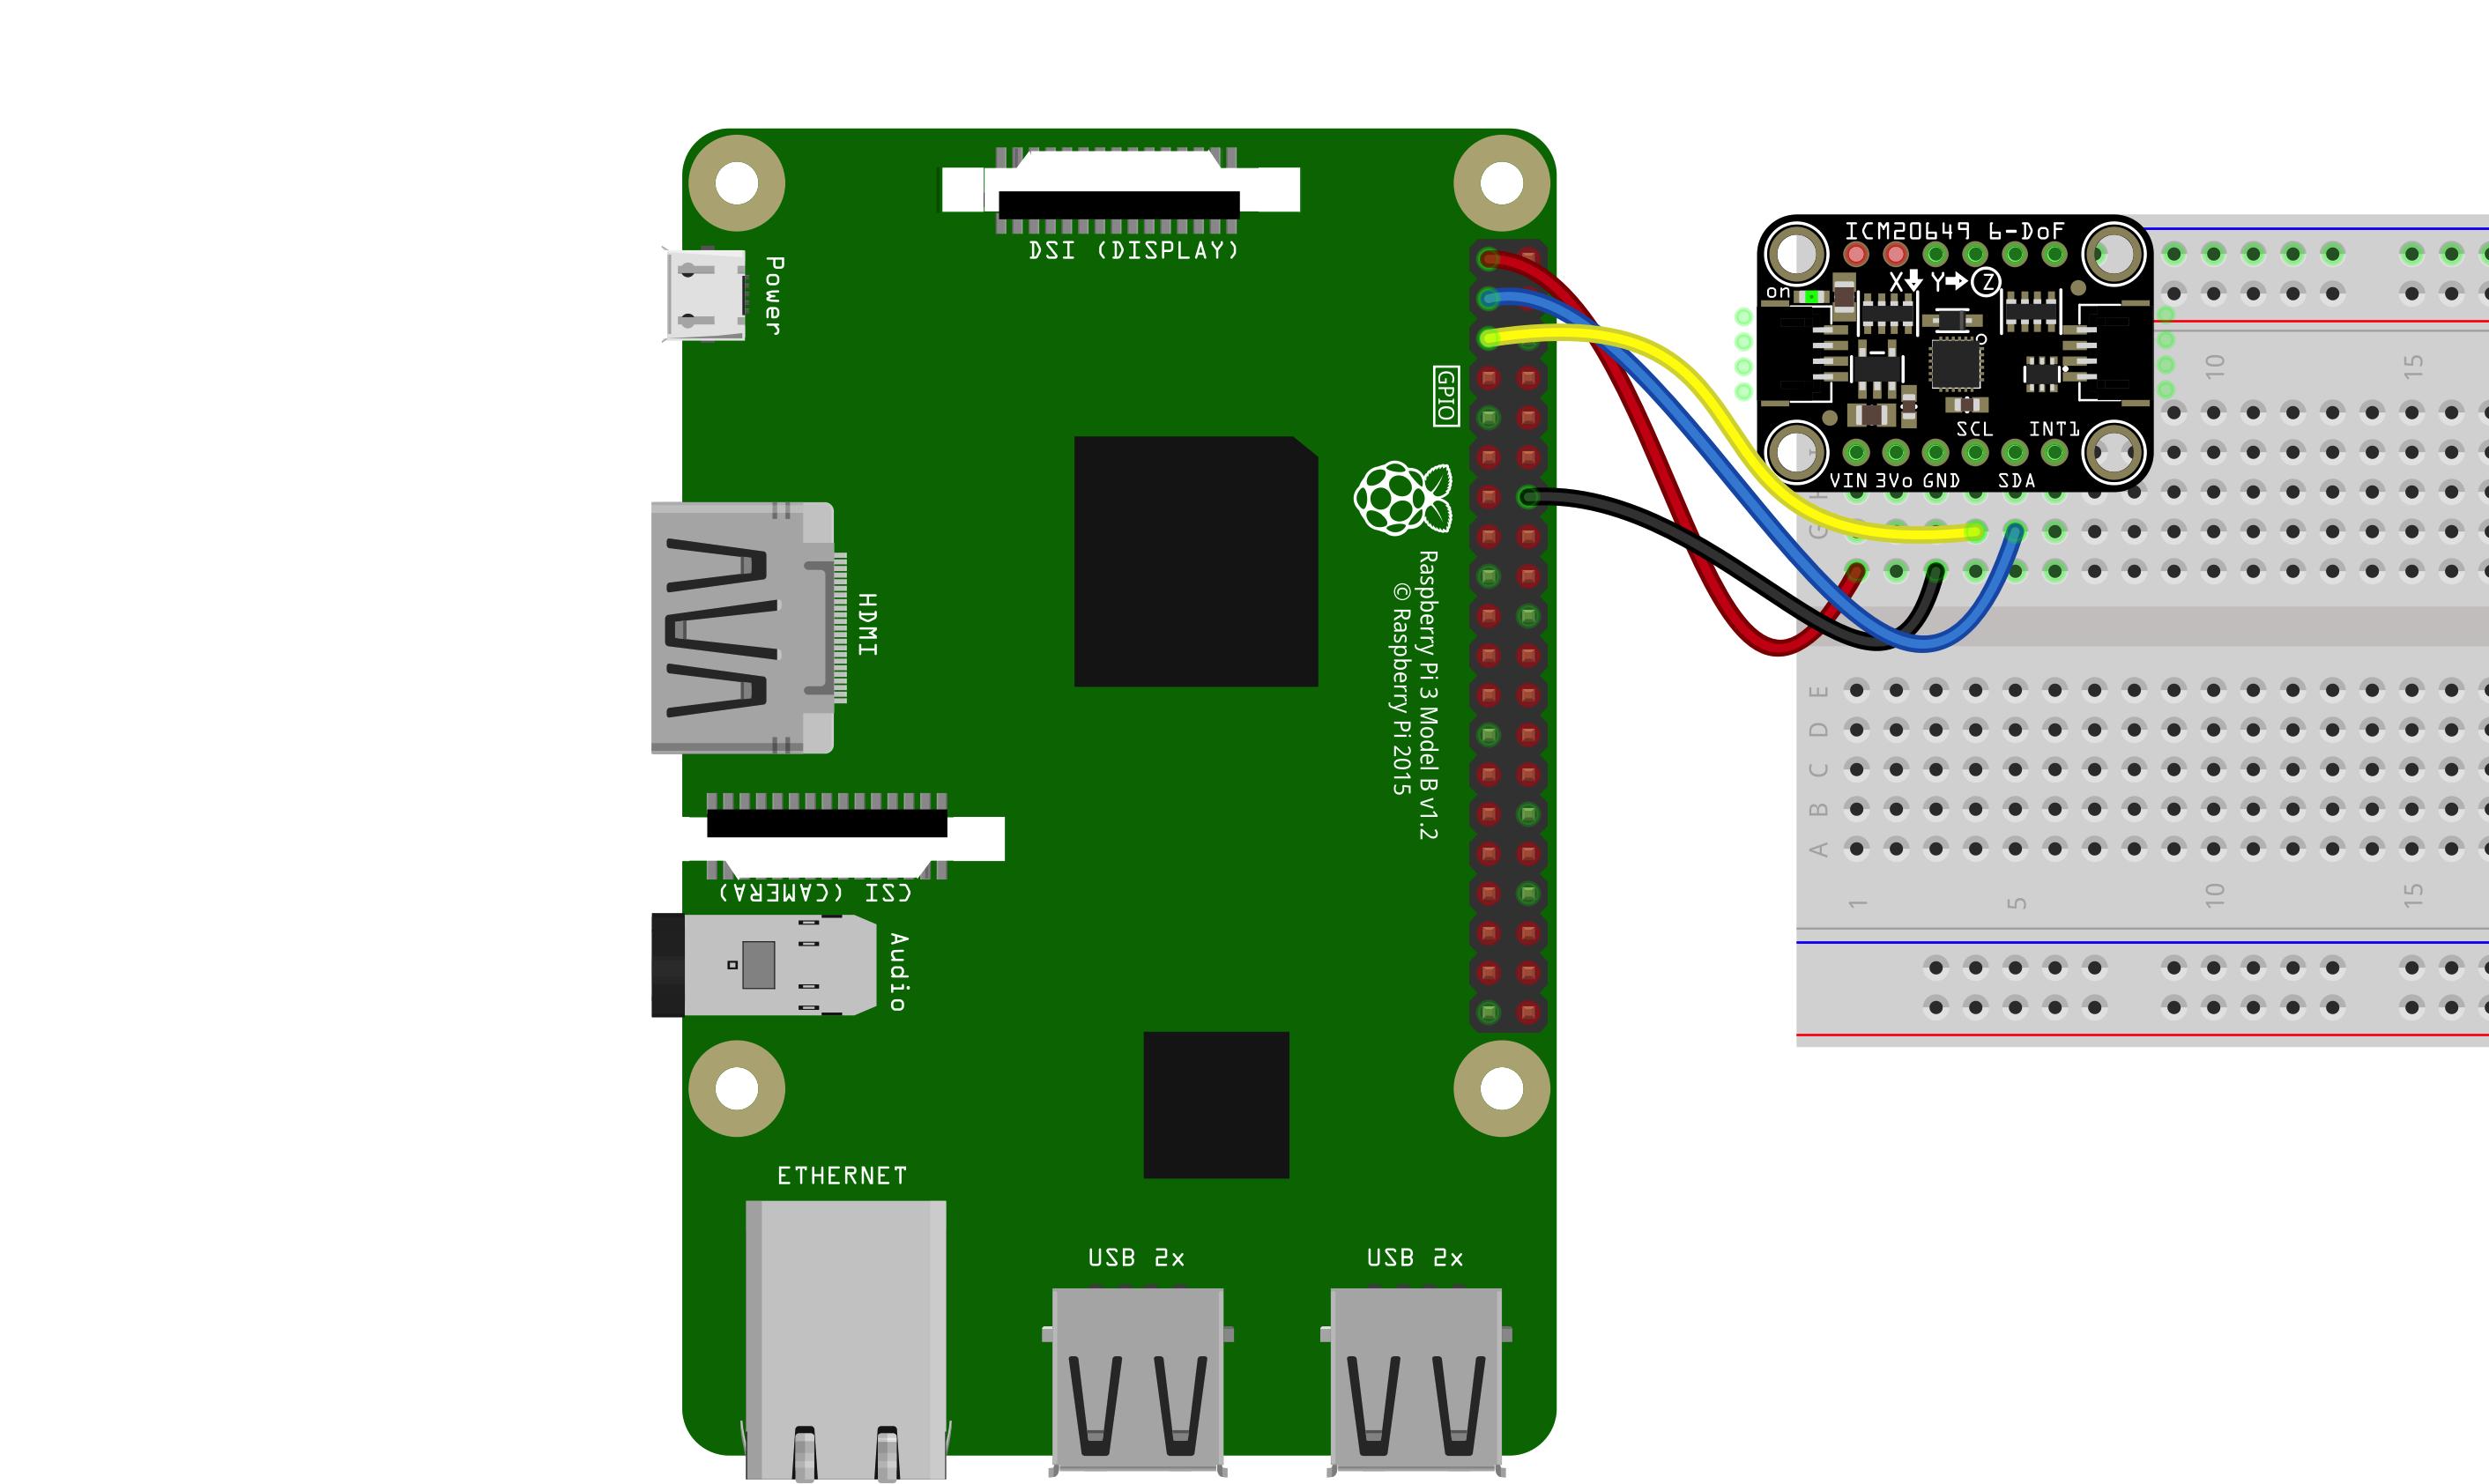 sensors_cz_rpi_wiring_bb.png